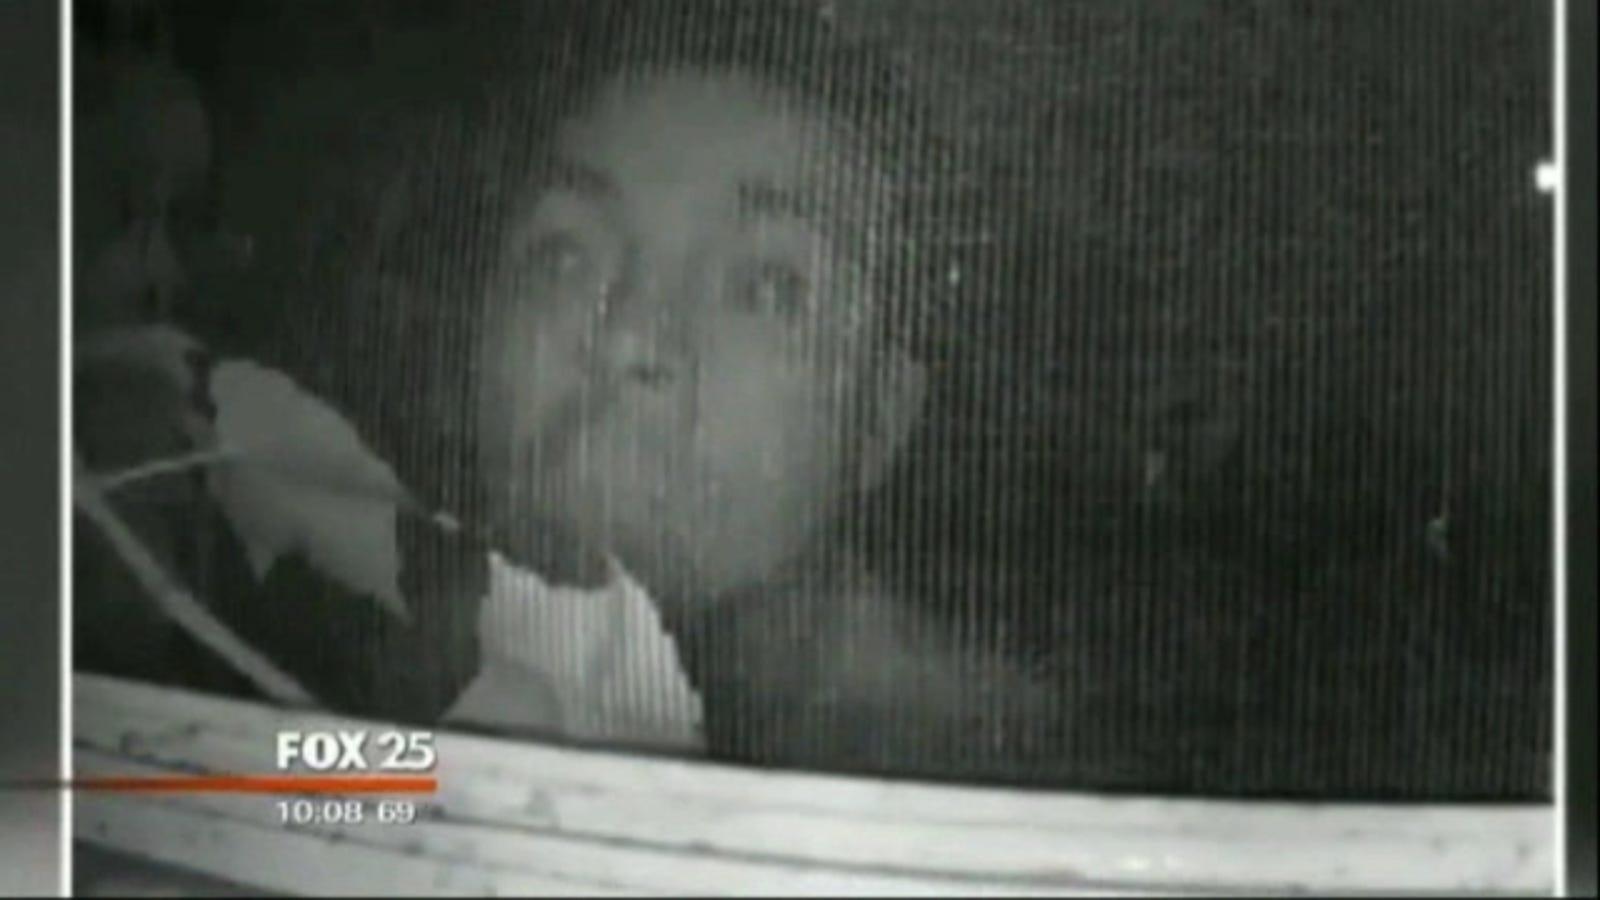 Creepy Ass Peeping Tom Caught On Bedroom Window